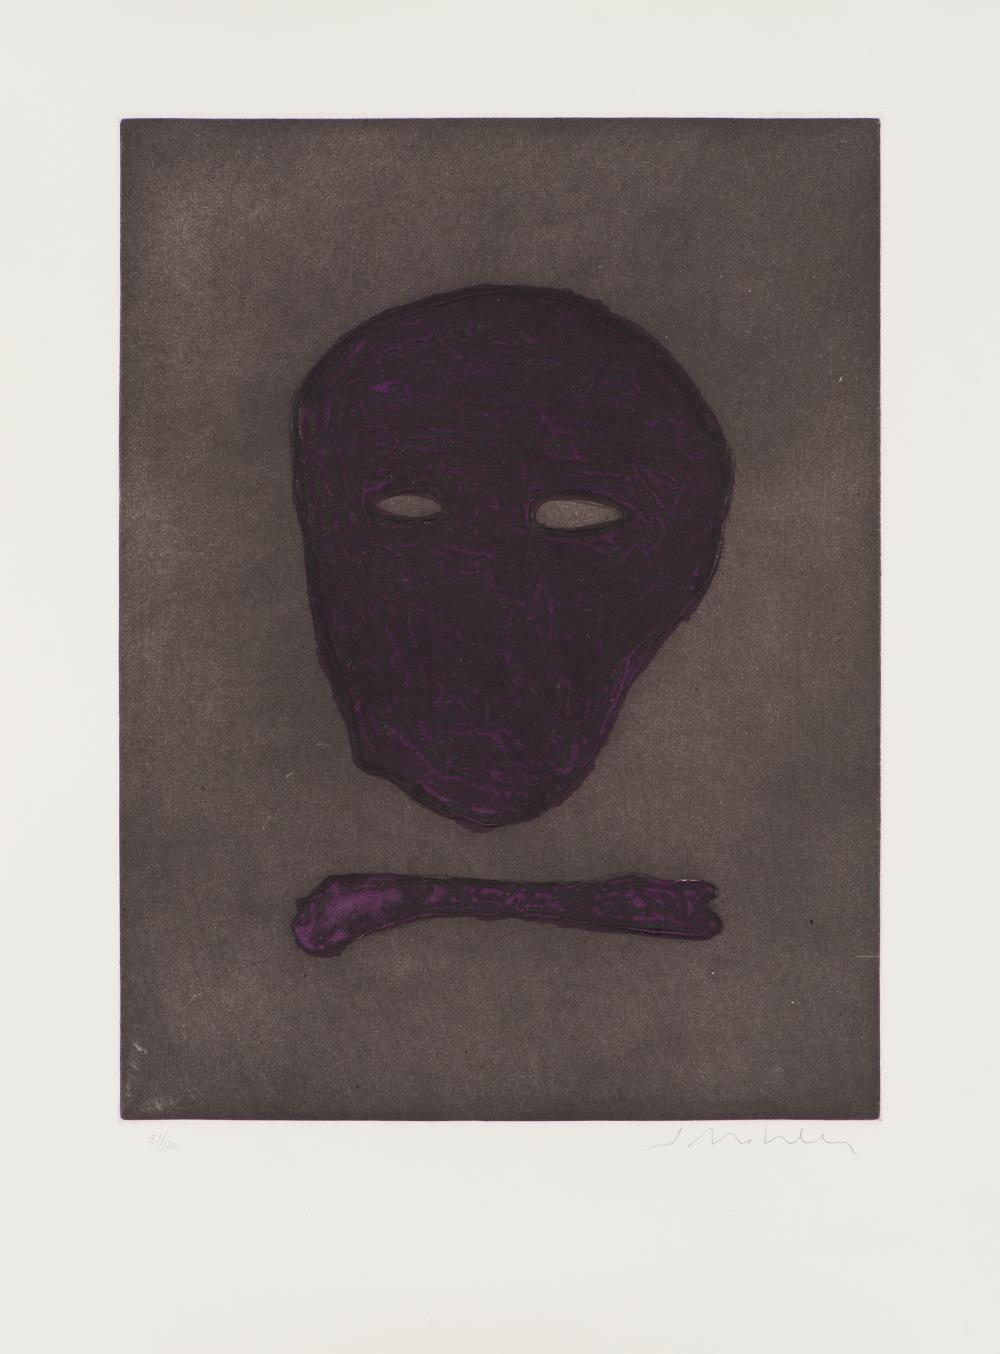 Fritz Scholder Mask of the Artist